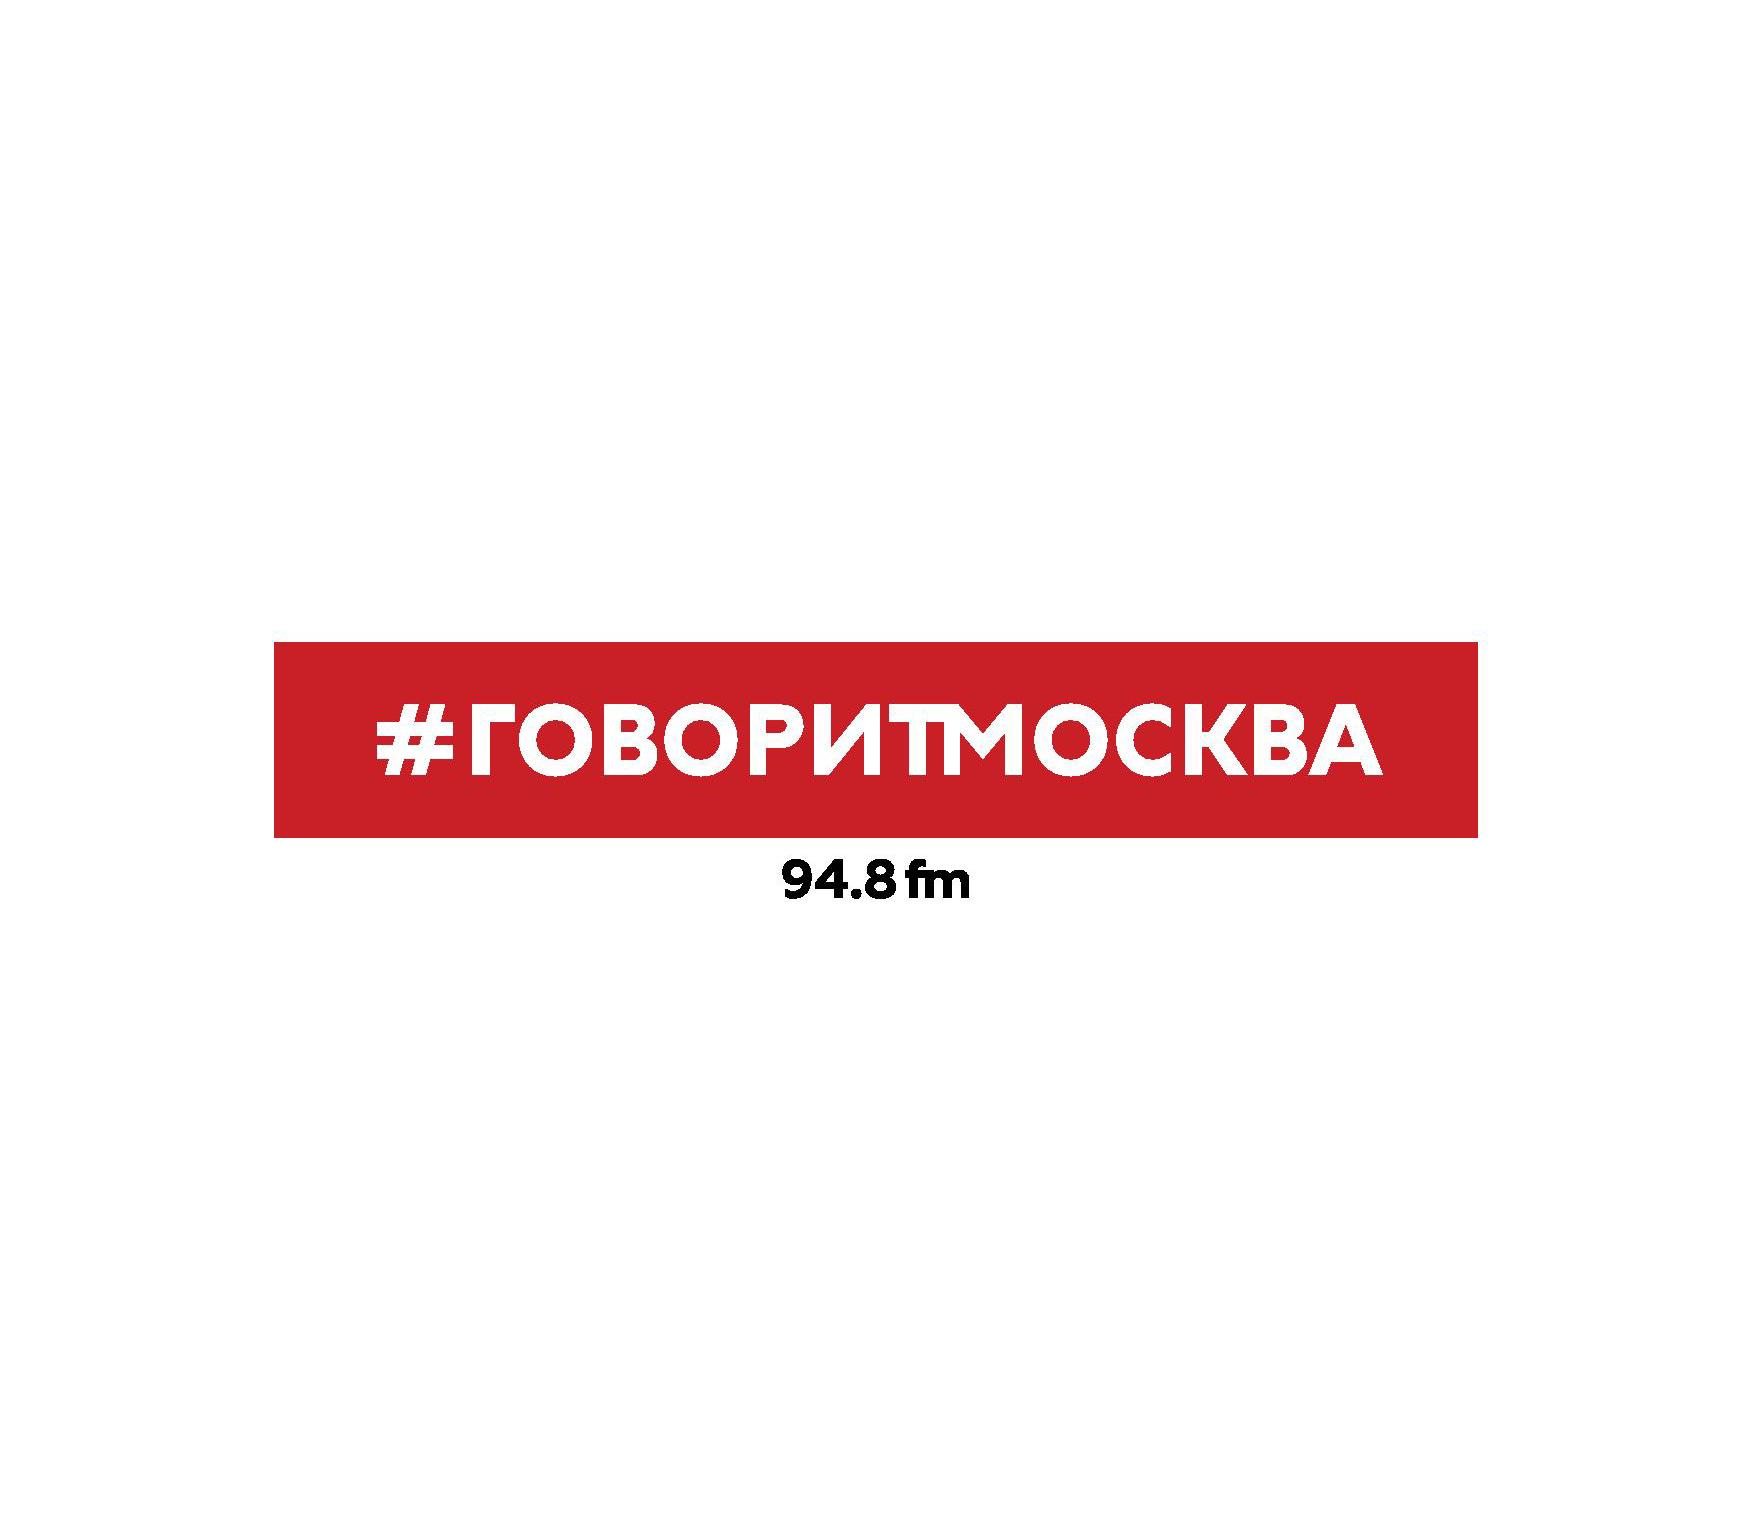 Сергей Береговой Александр I и старец Федор Томский сергей нечаев александр i